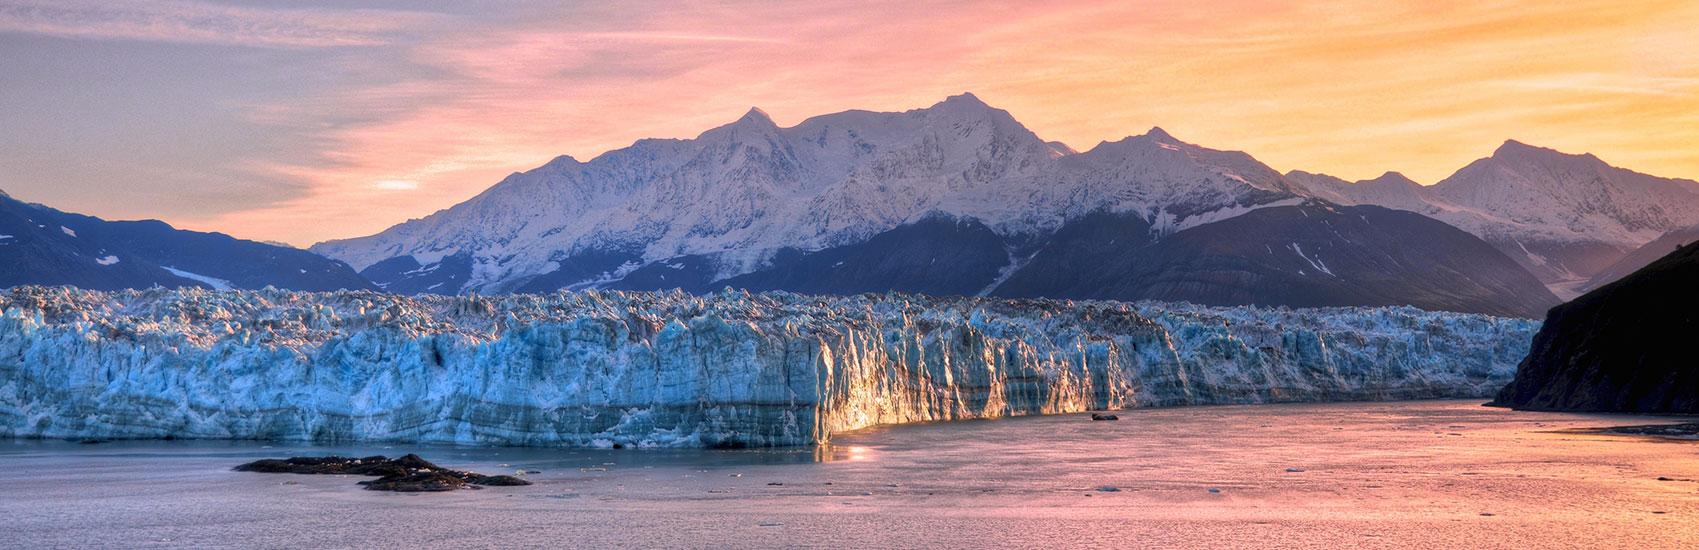 Ultimate Alaska with Oceania Cruises 3